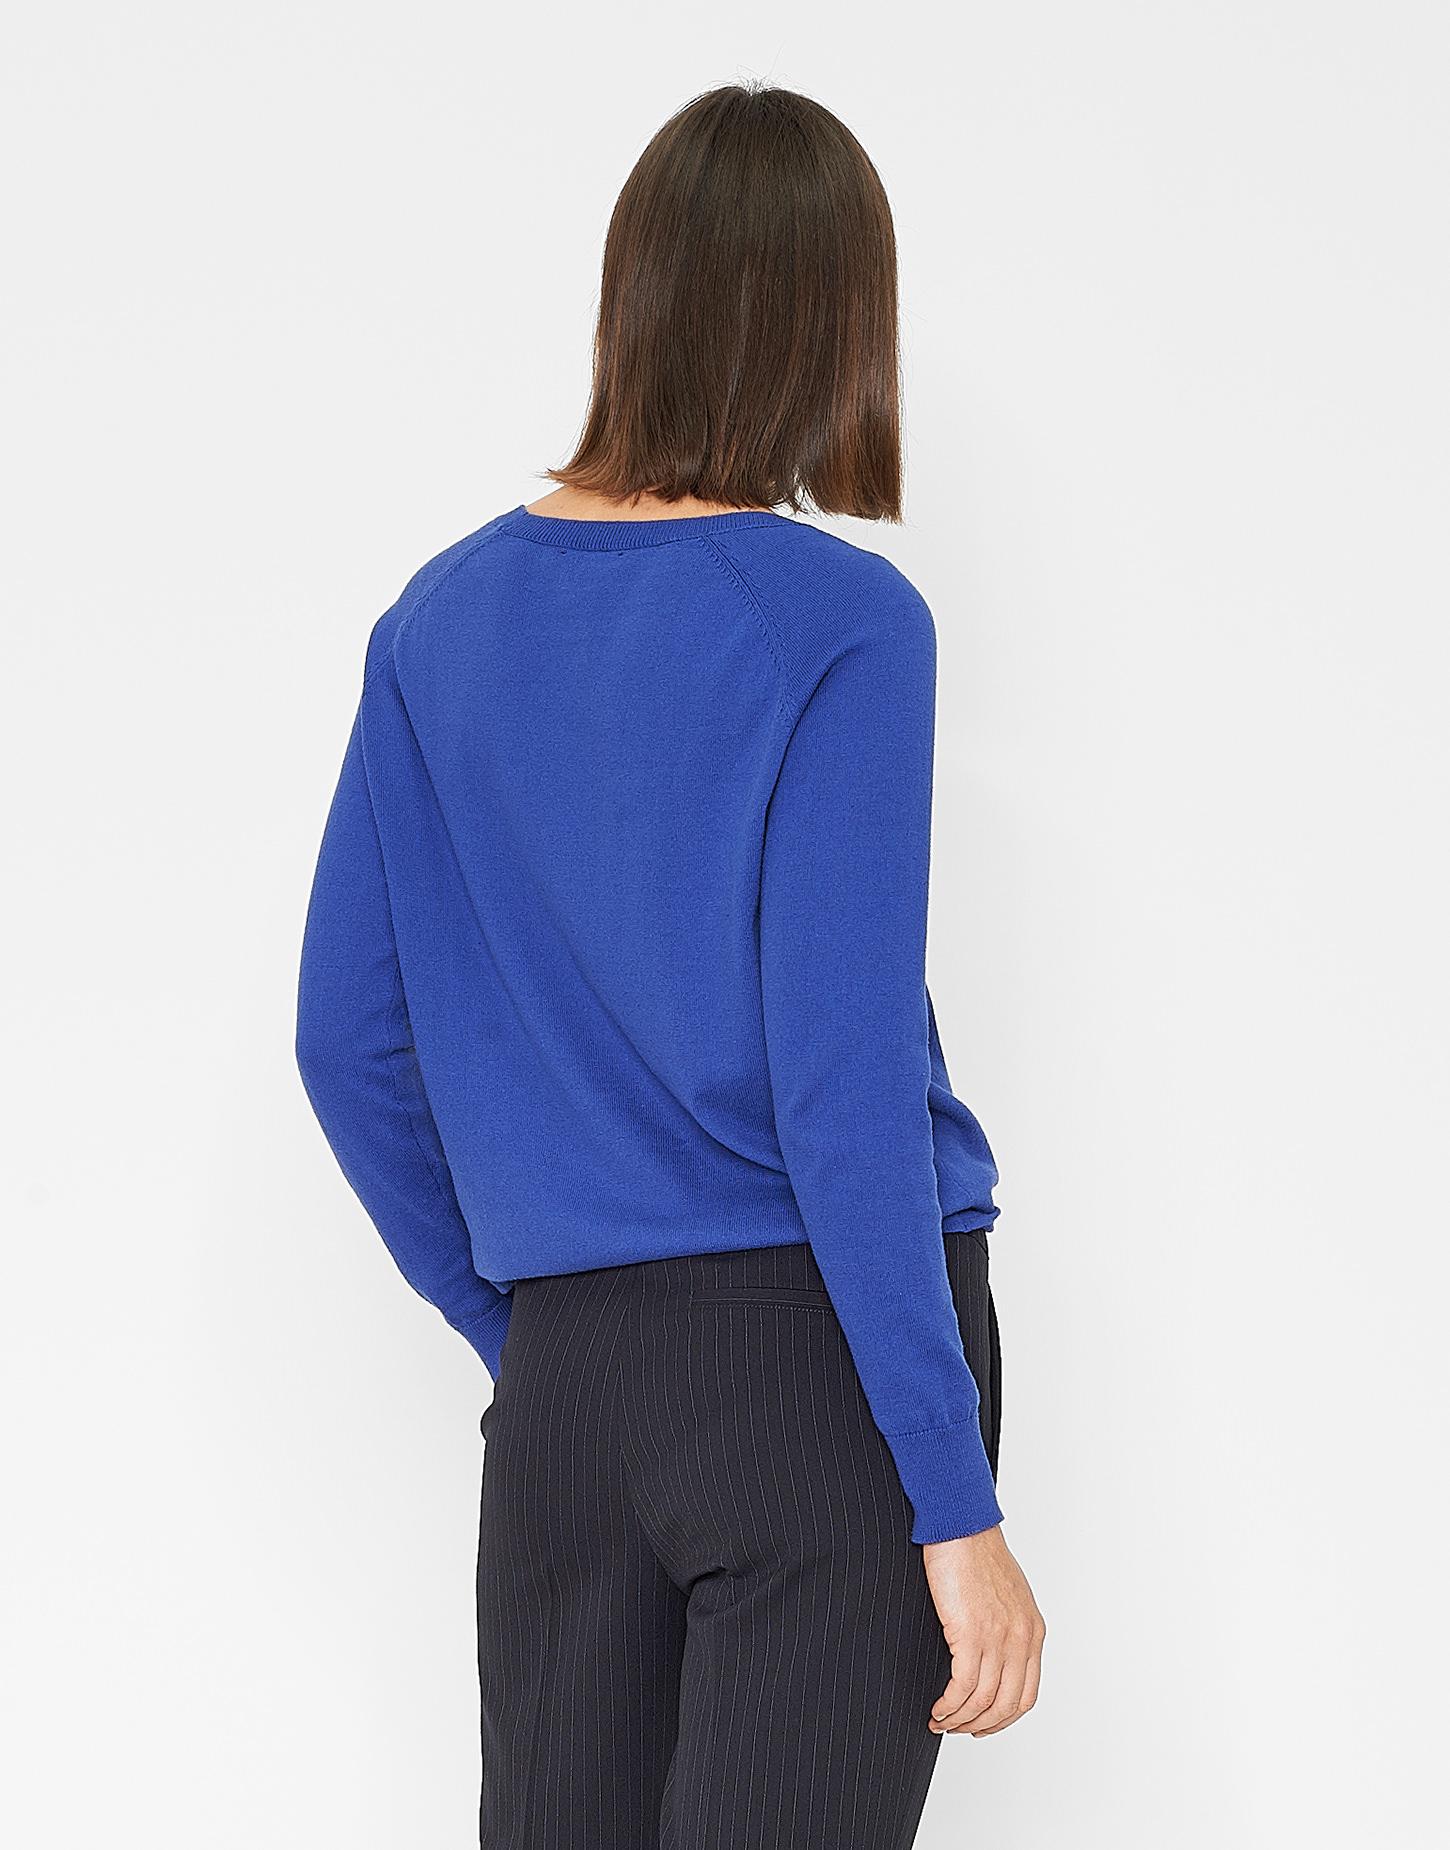 Baumwoll Pullover Paola SP OPUS 8KtZpj